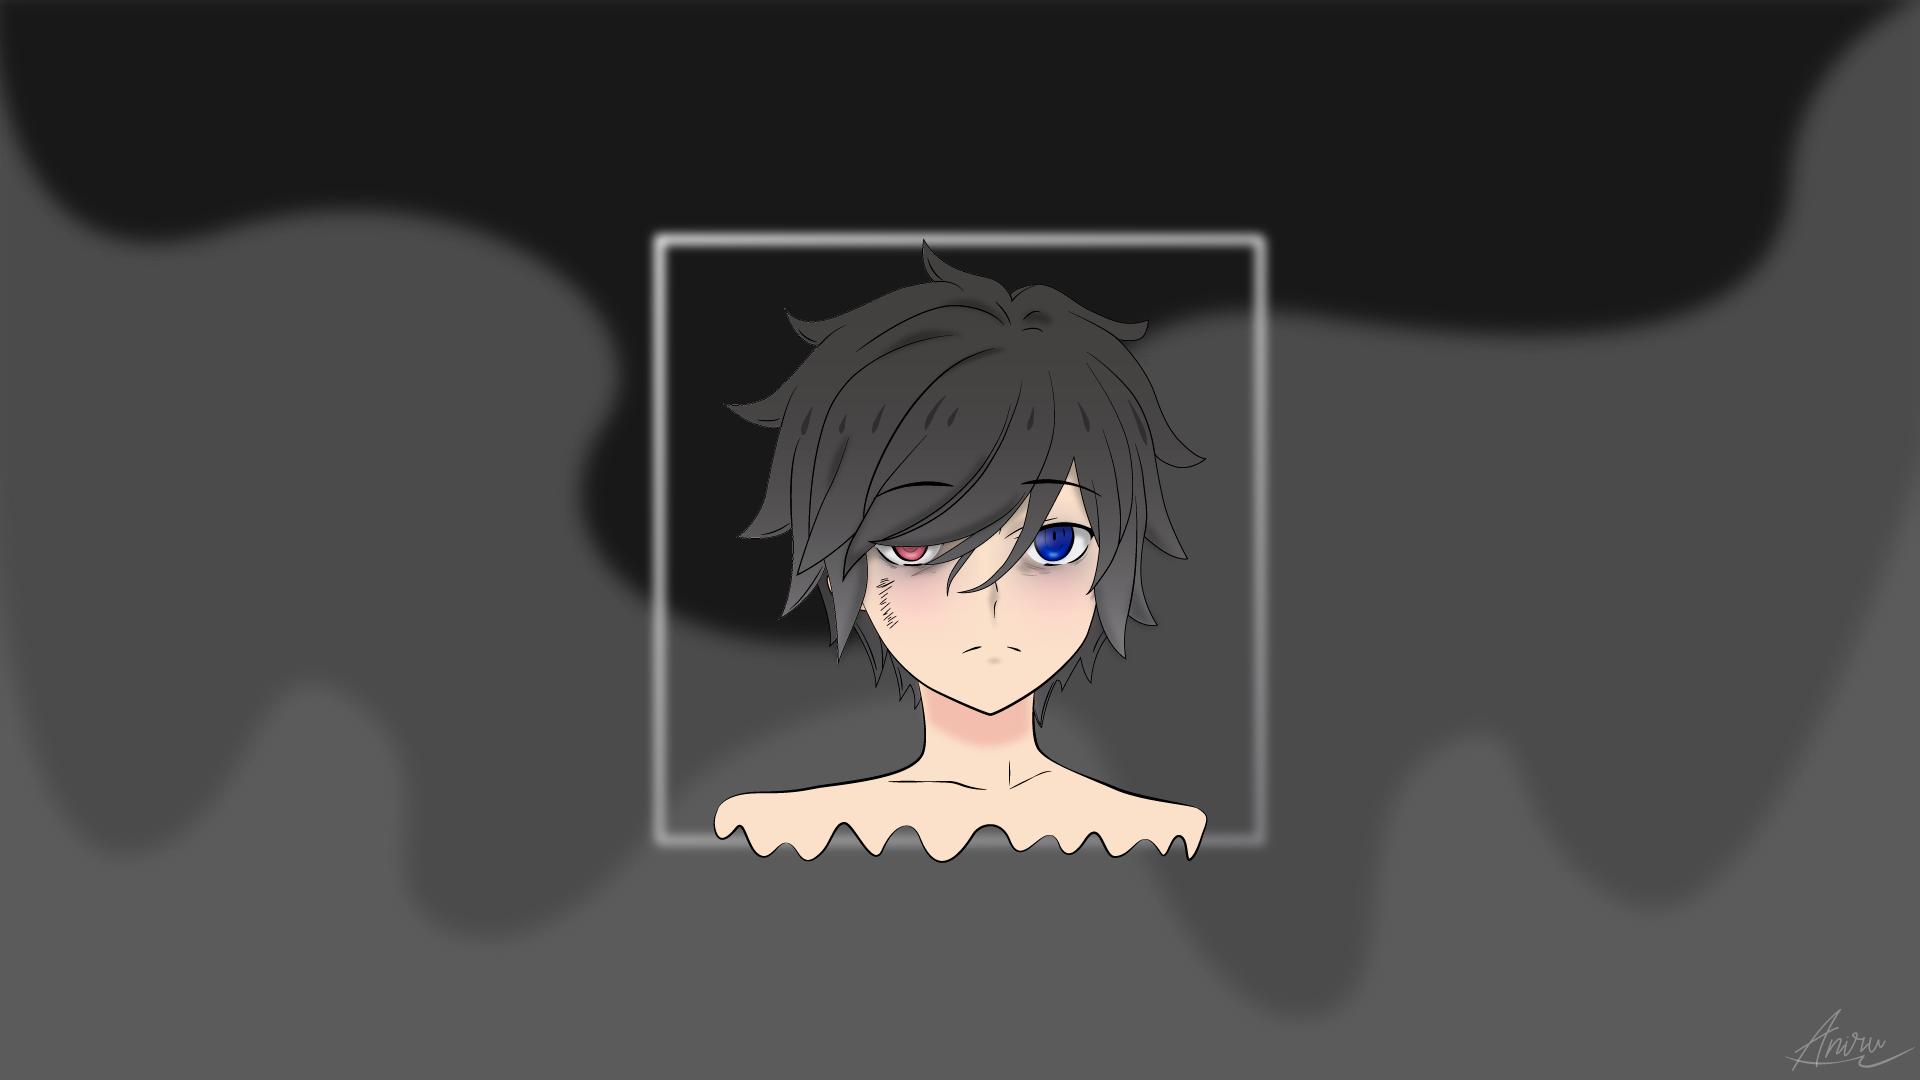 Anime Boy Hd Wallpaper Hintergrund 1920x1080 Id